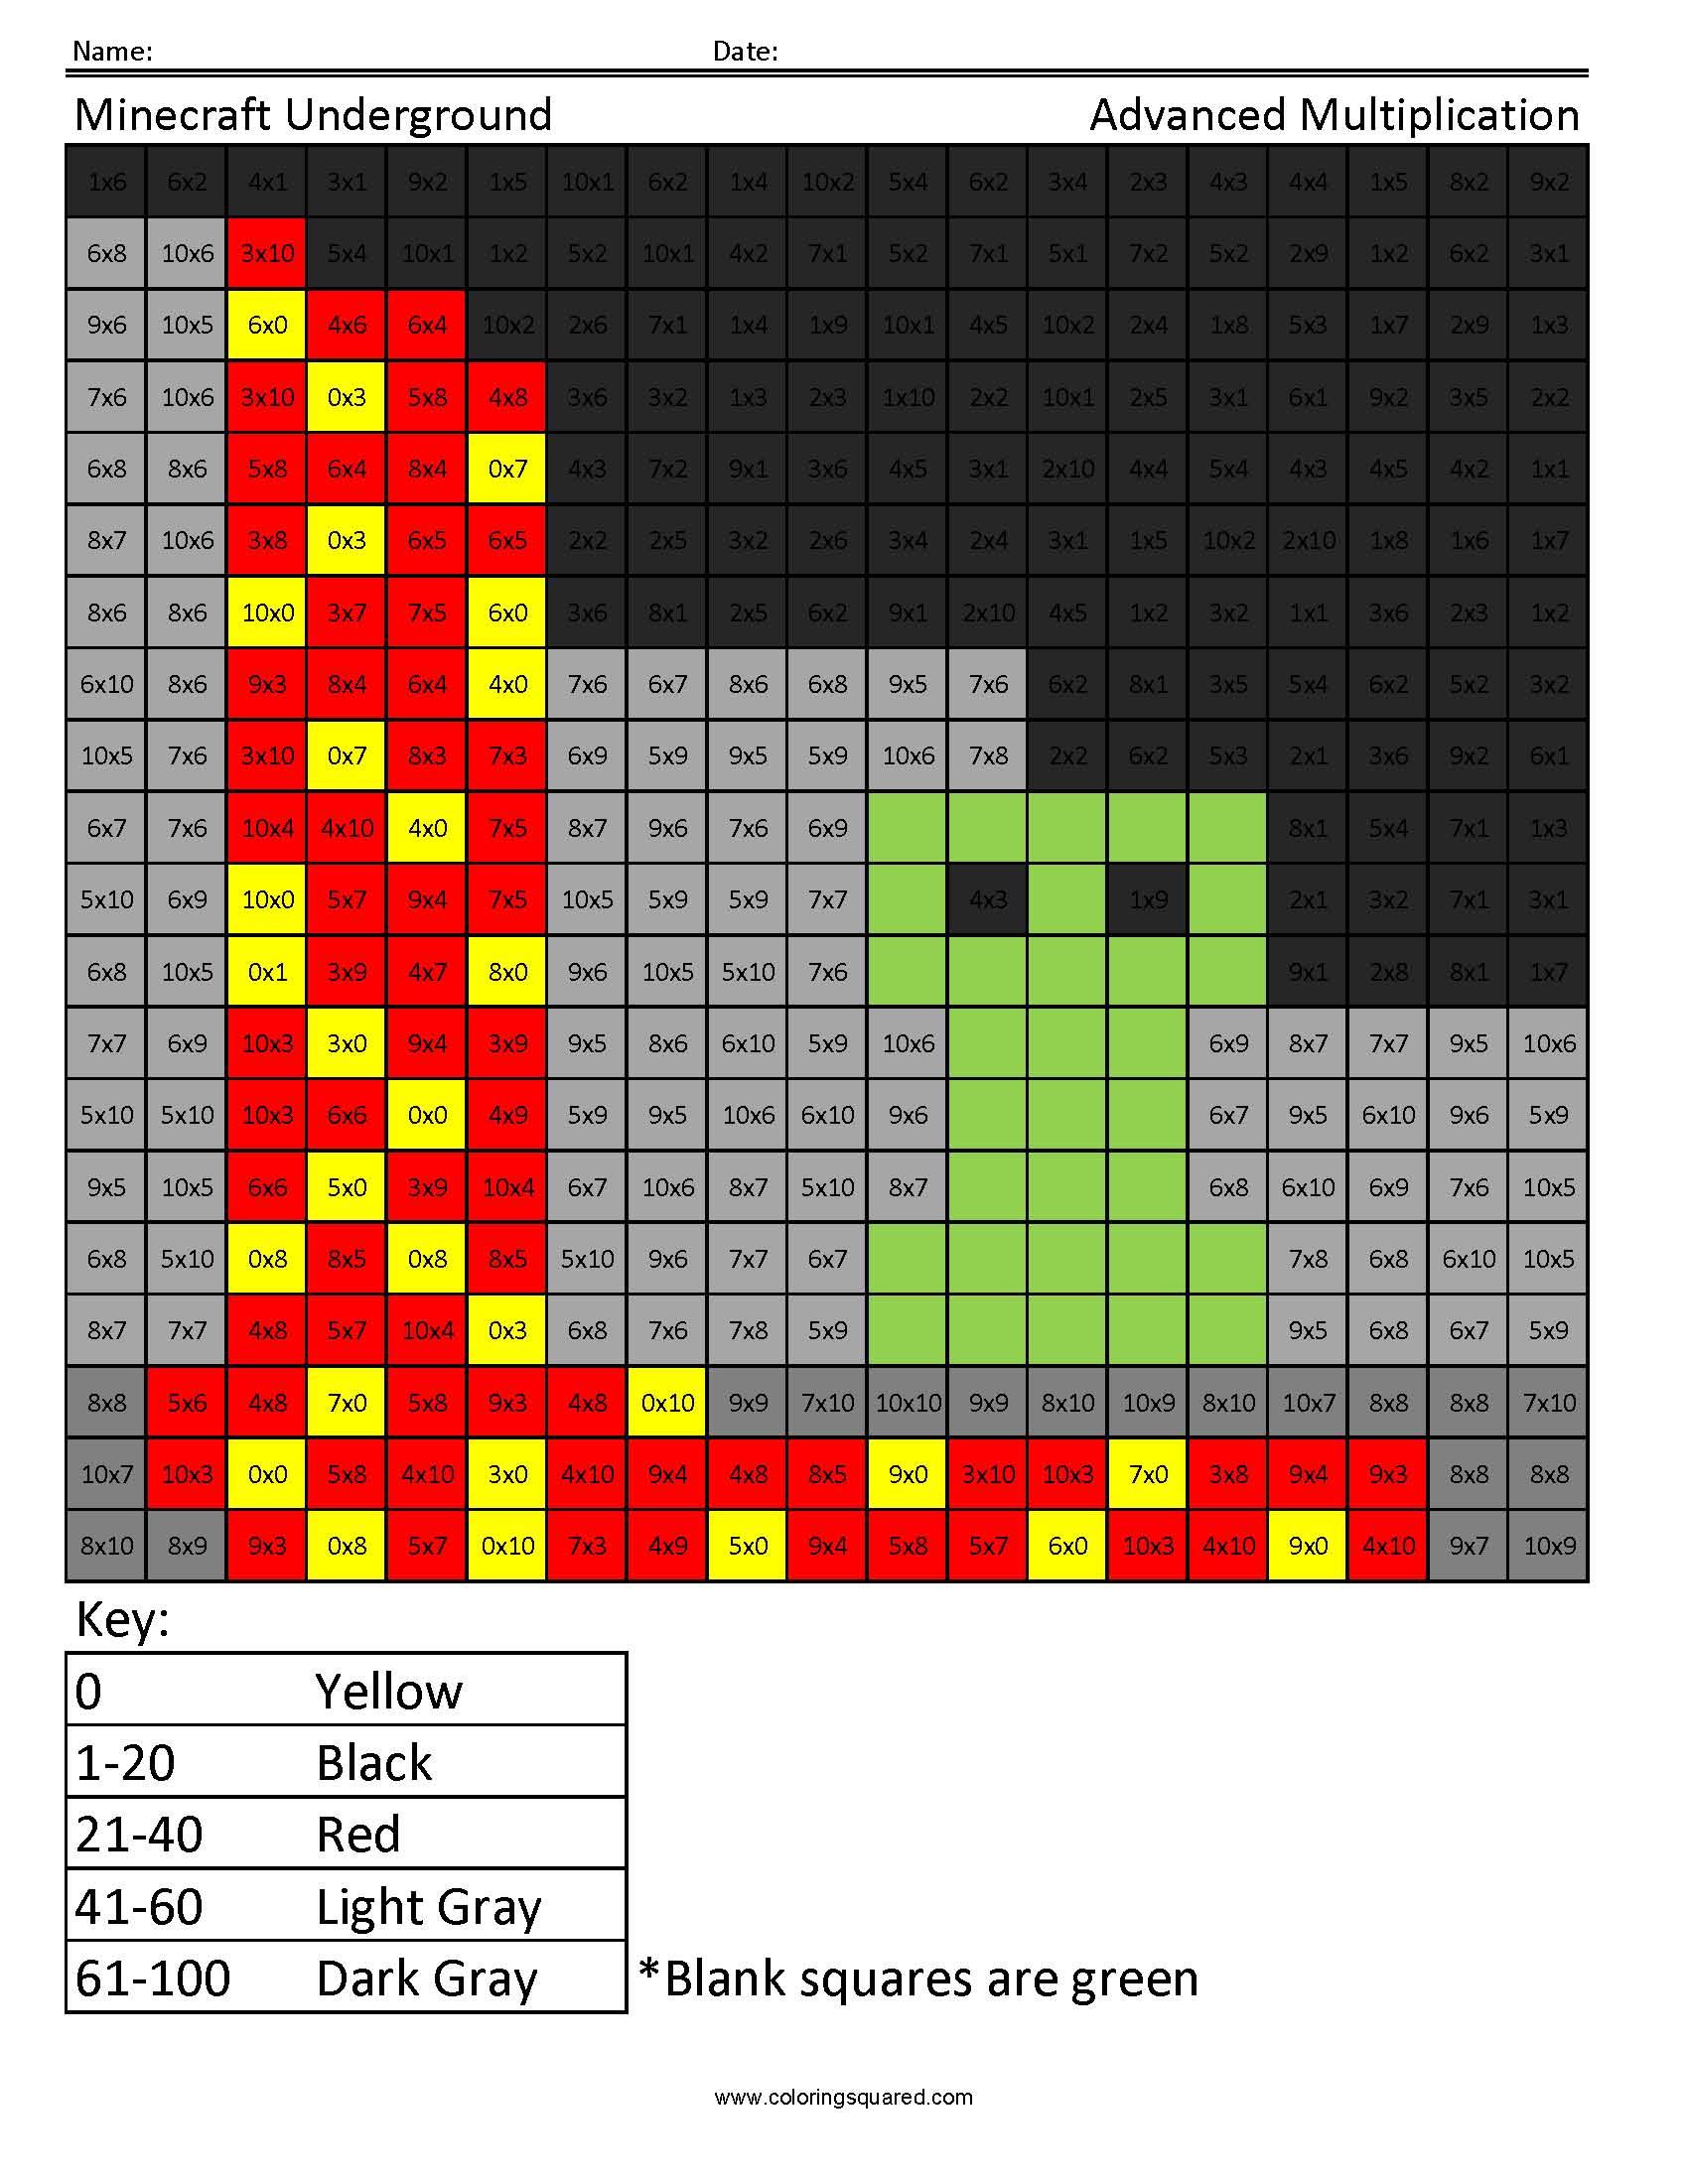 Minecraft Underground Advanced Multiplication